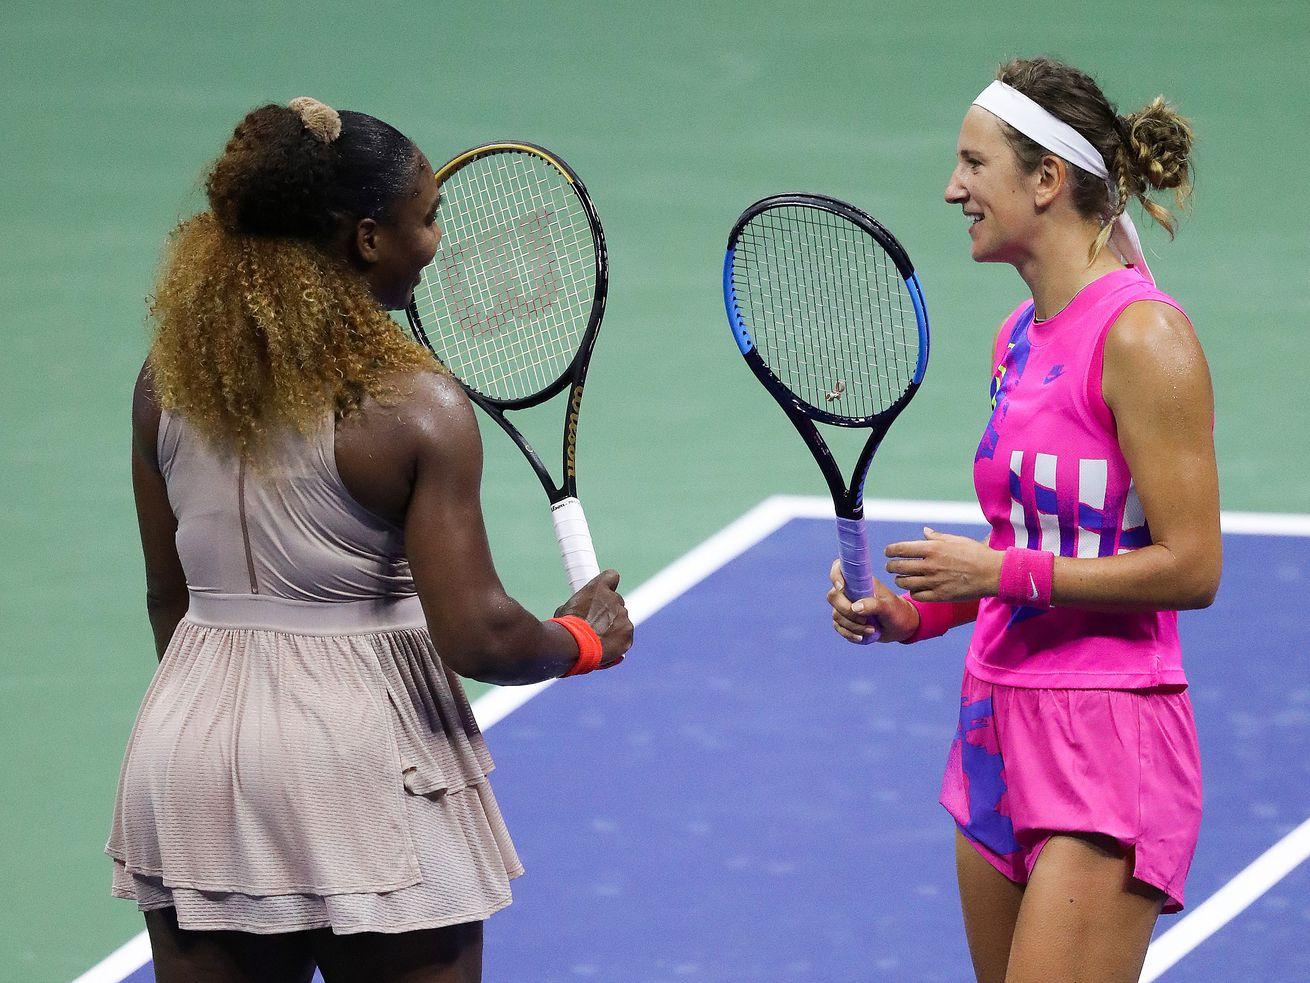 Serena Williams and Victoria Azarenka